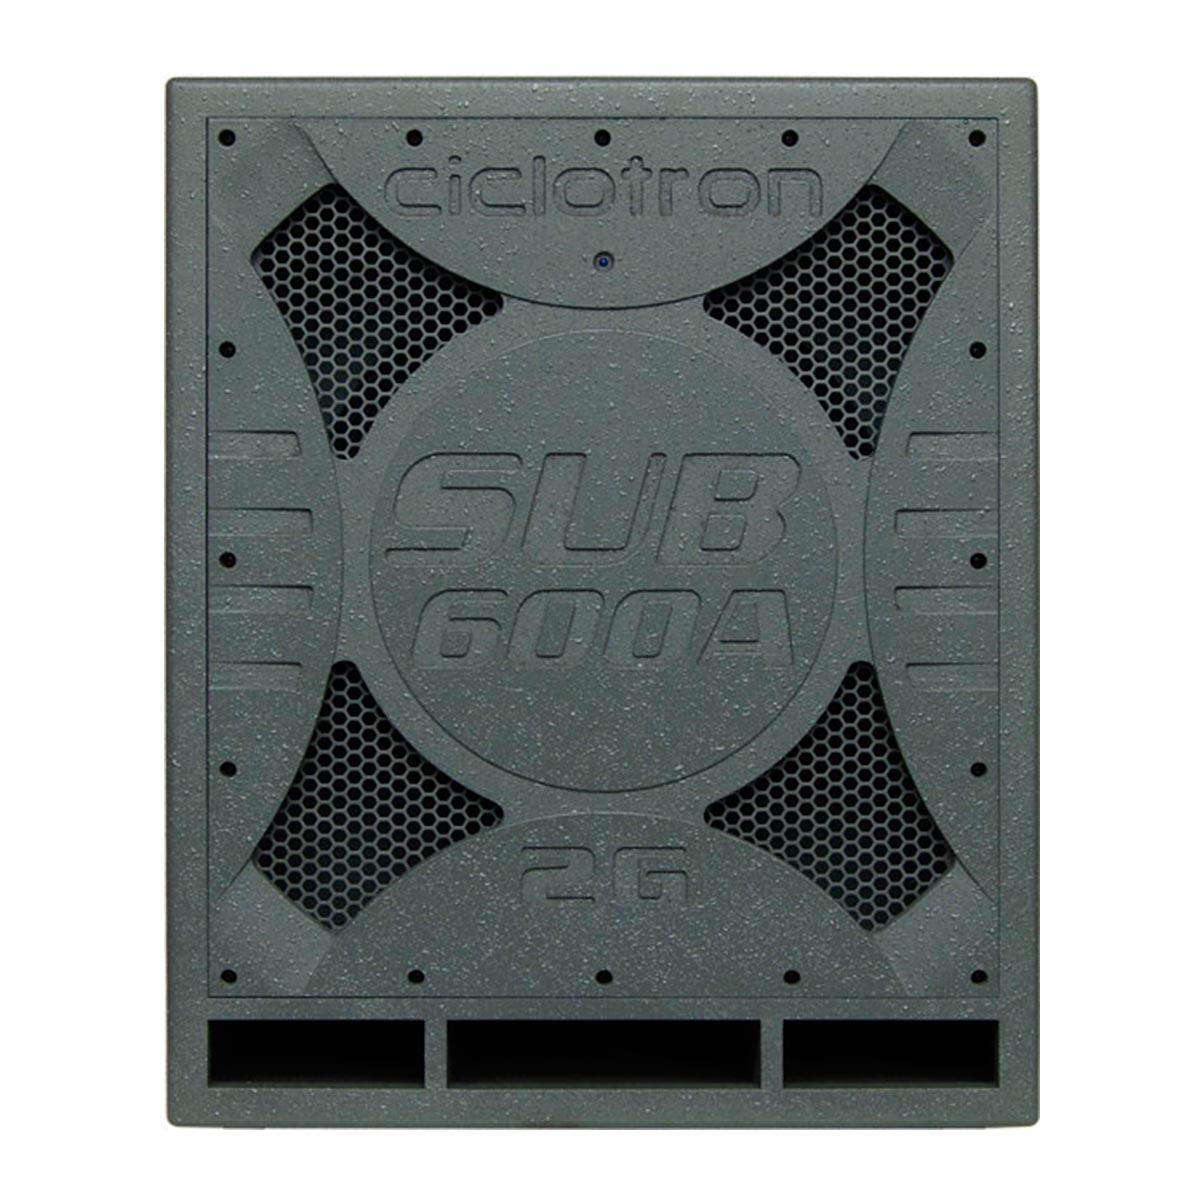 600A - Subwoofer Ativo 600W SUB 600 A - Ciclotron